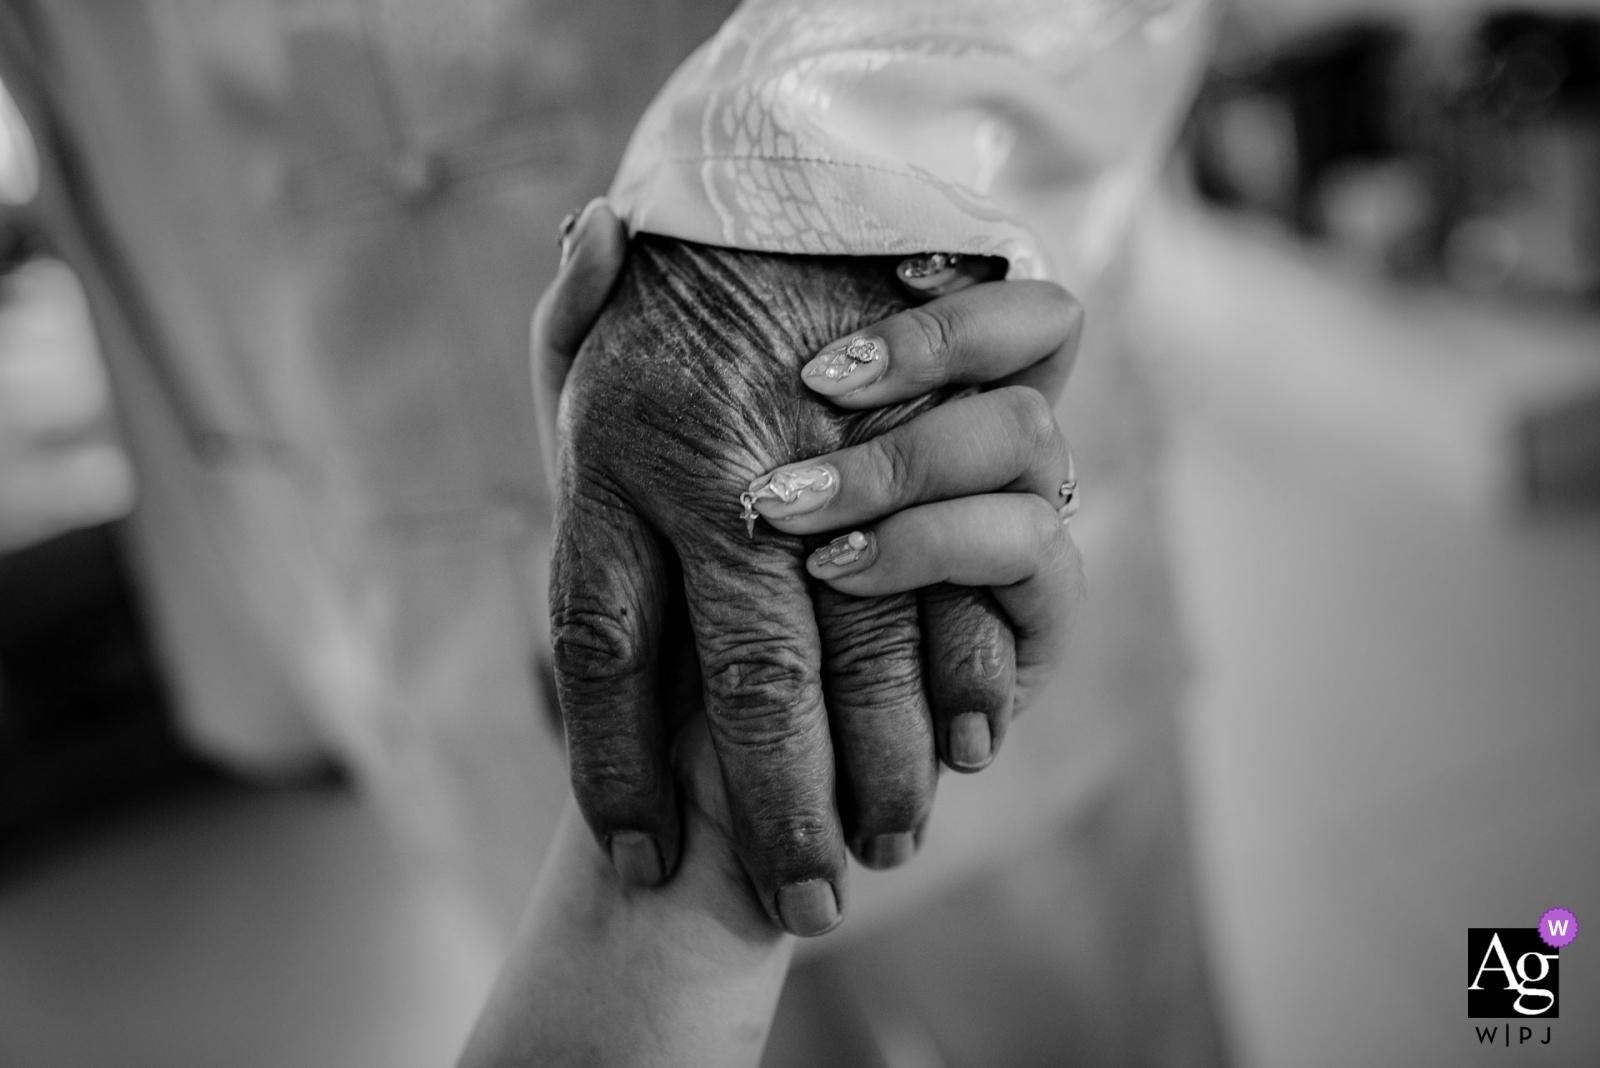 Moana Wu is an artistic wedding photographer for